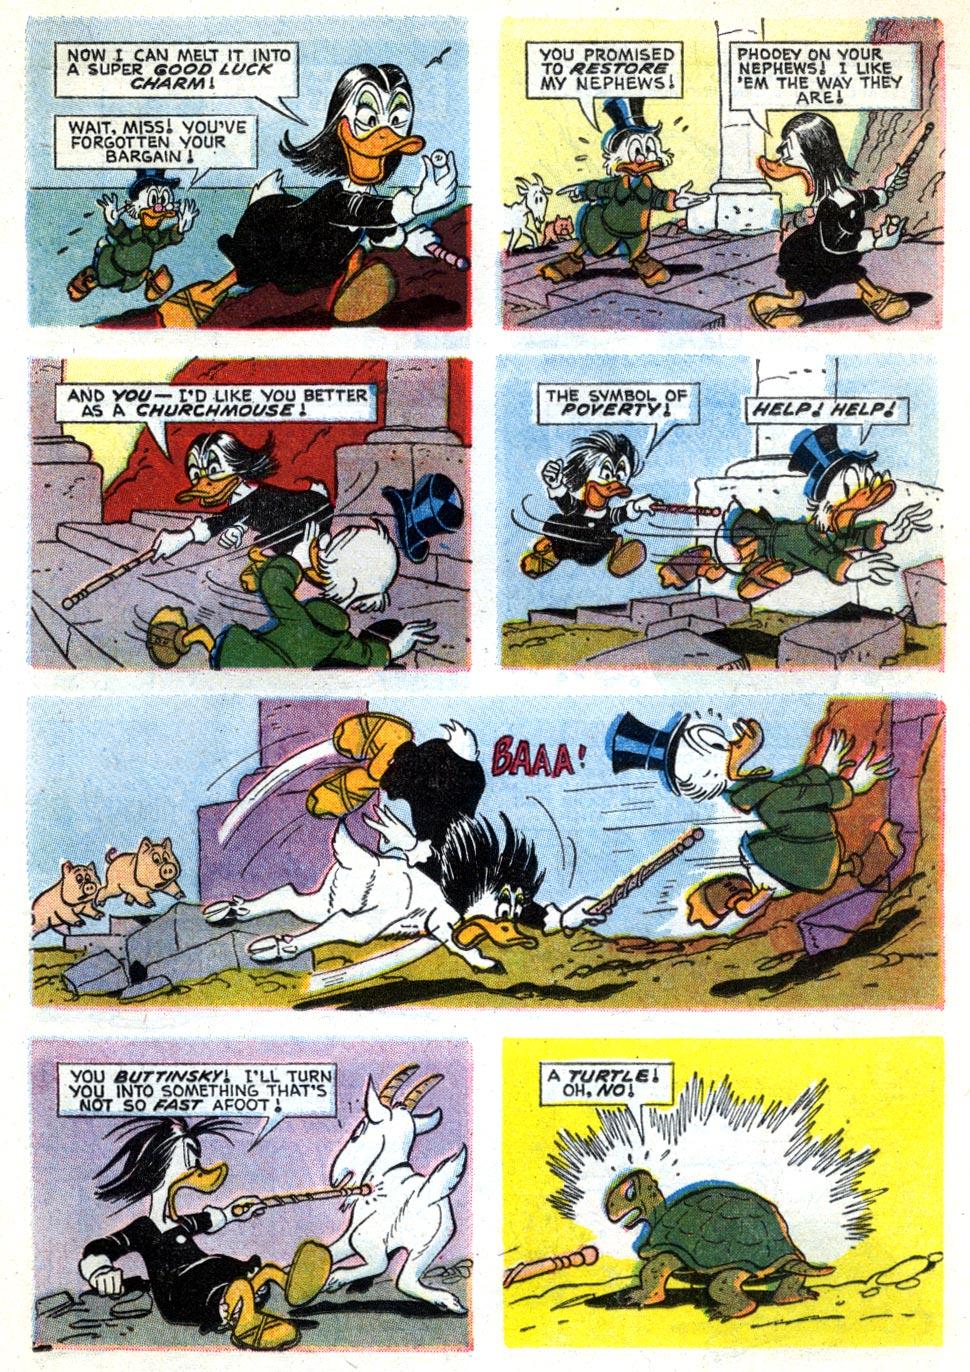 (1953) Issue #329 </opti #365 - English 17